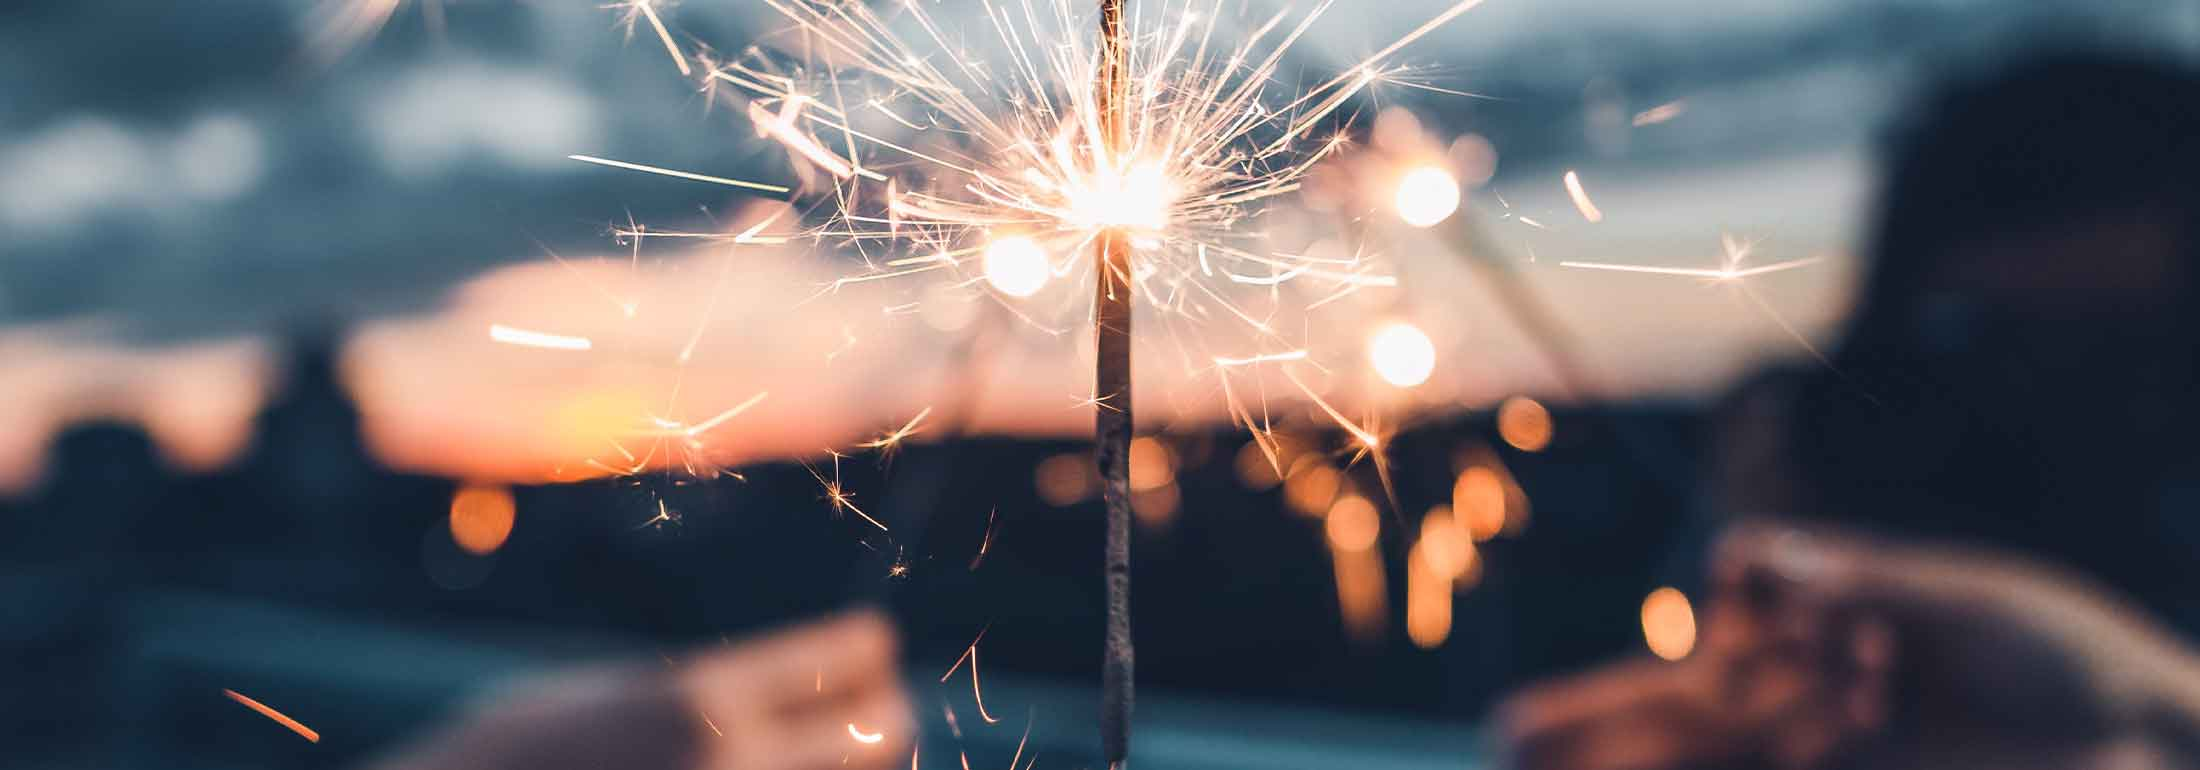 blog-post-1-year-celebration